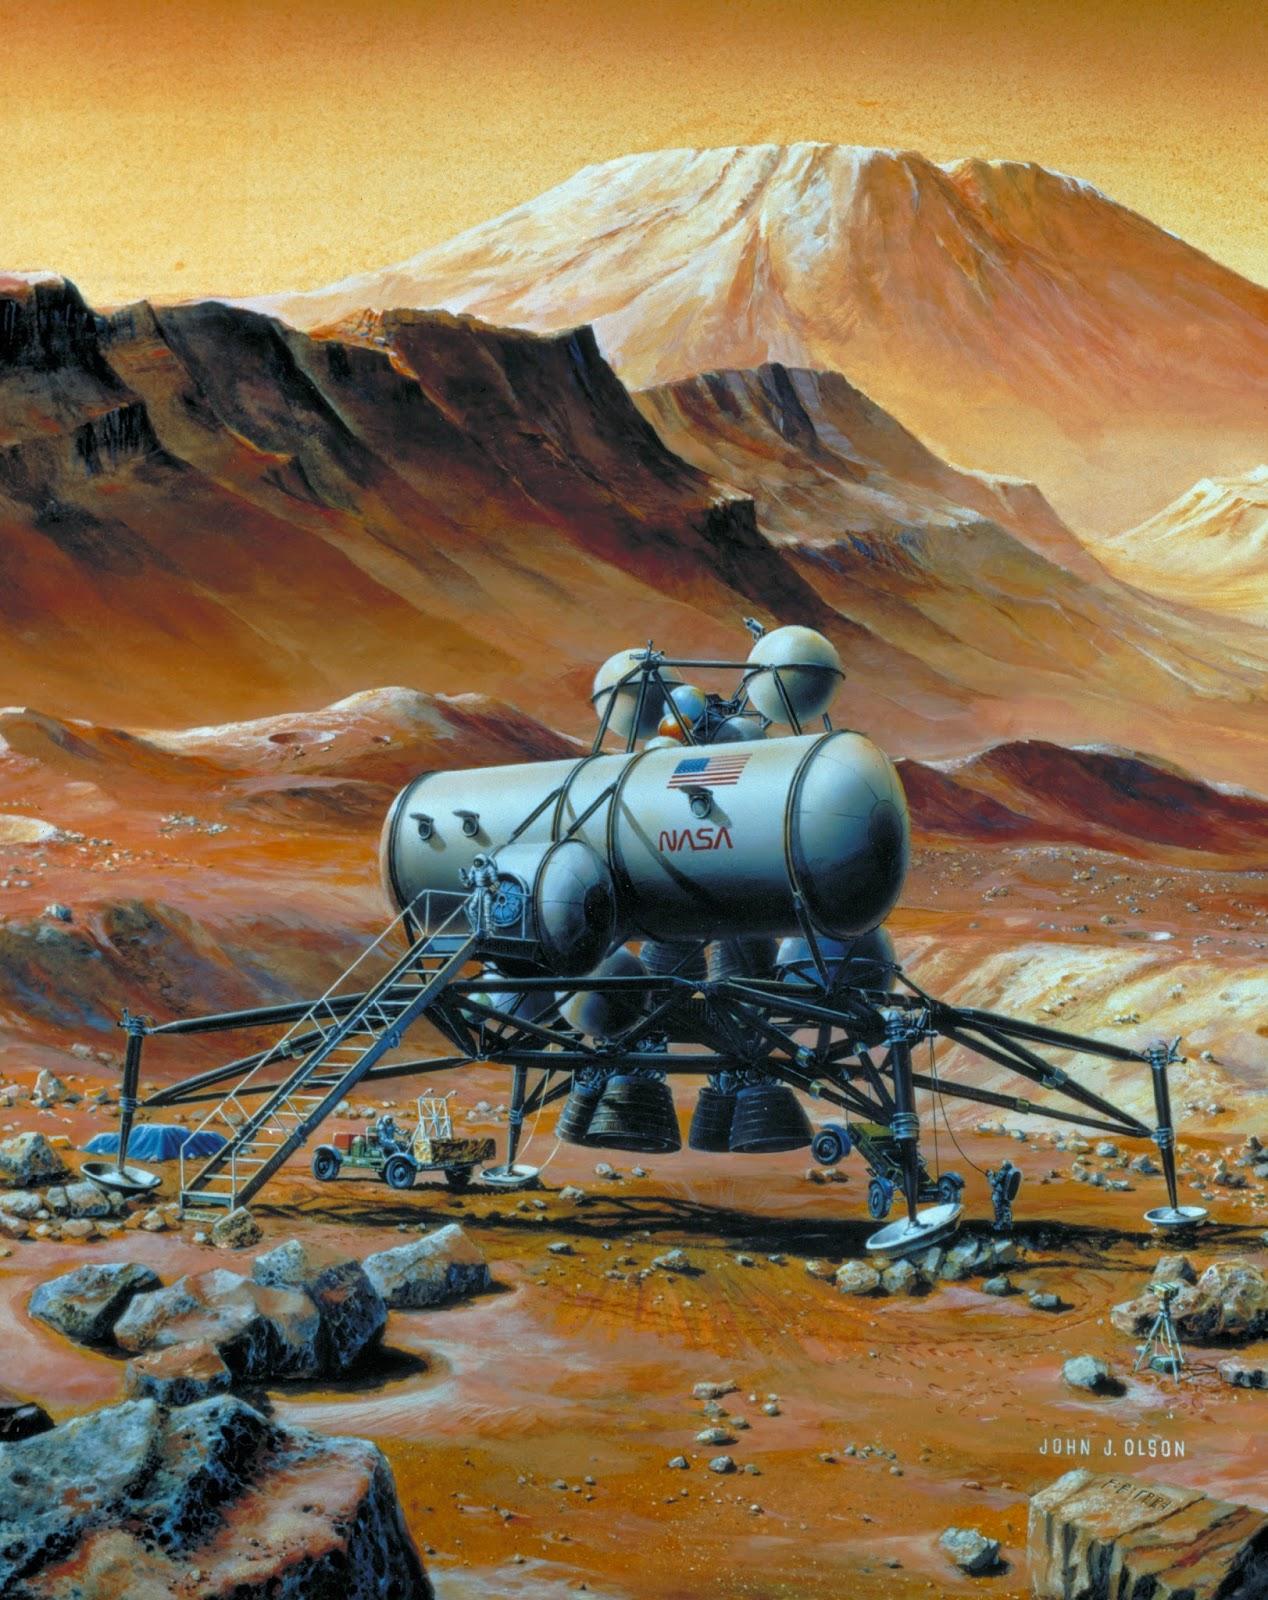 Mars base by John J. Olson (NASA, 1992)